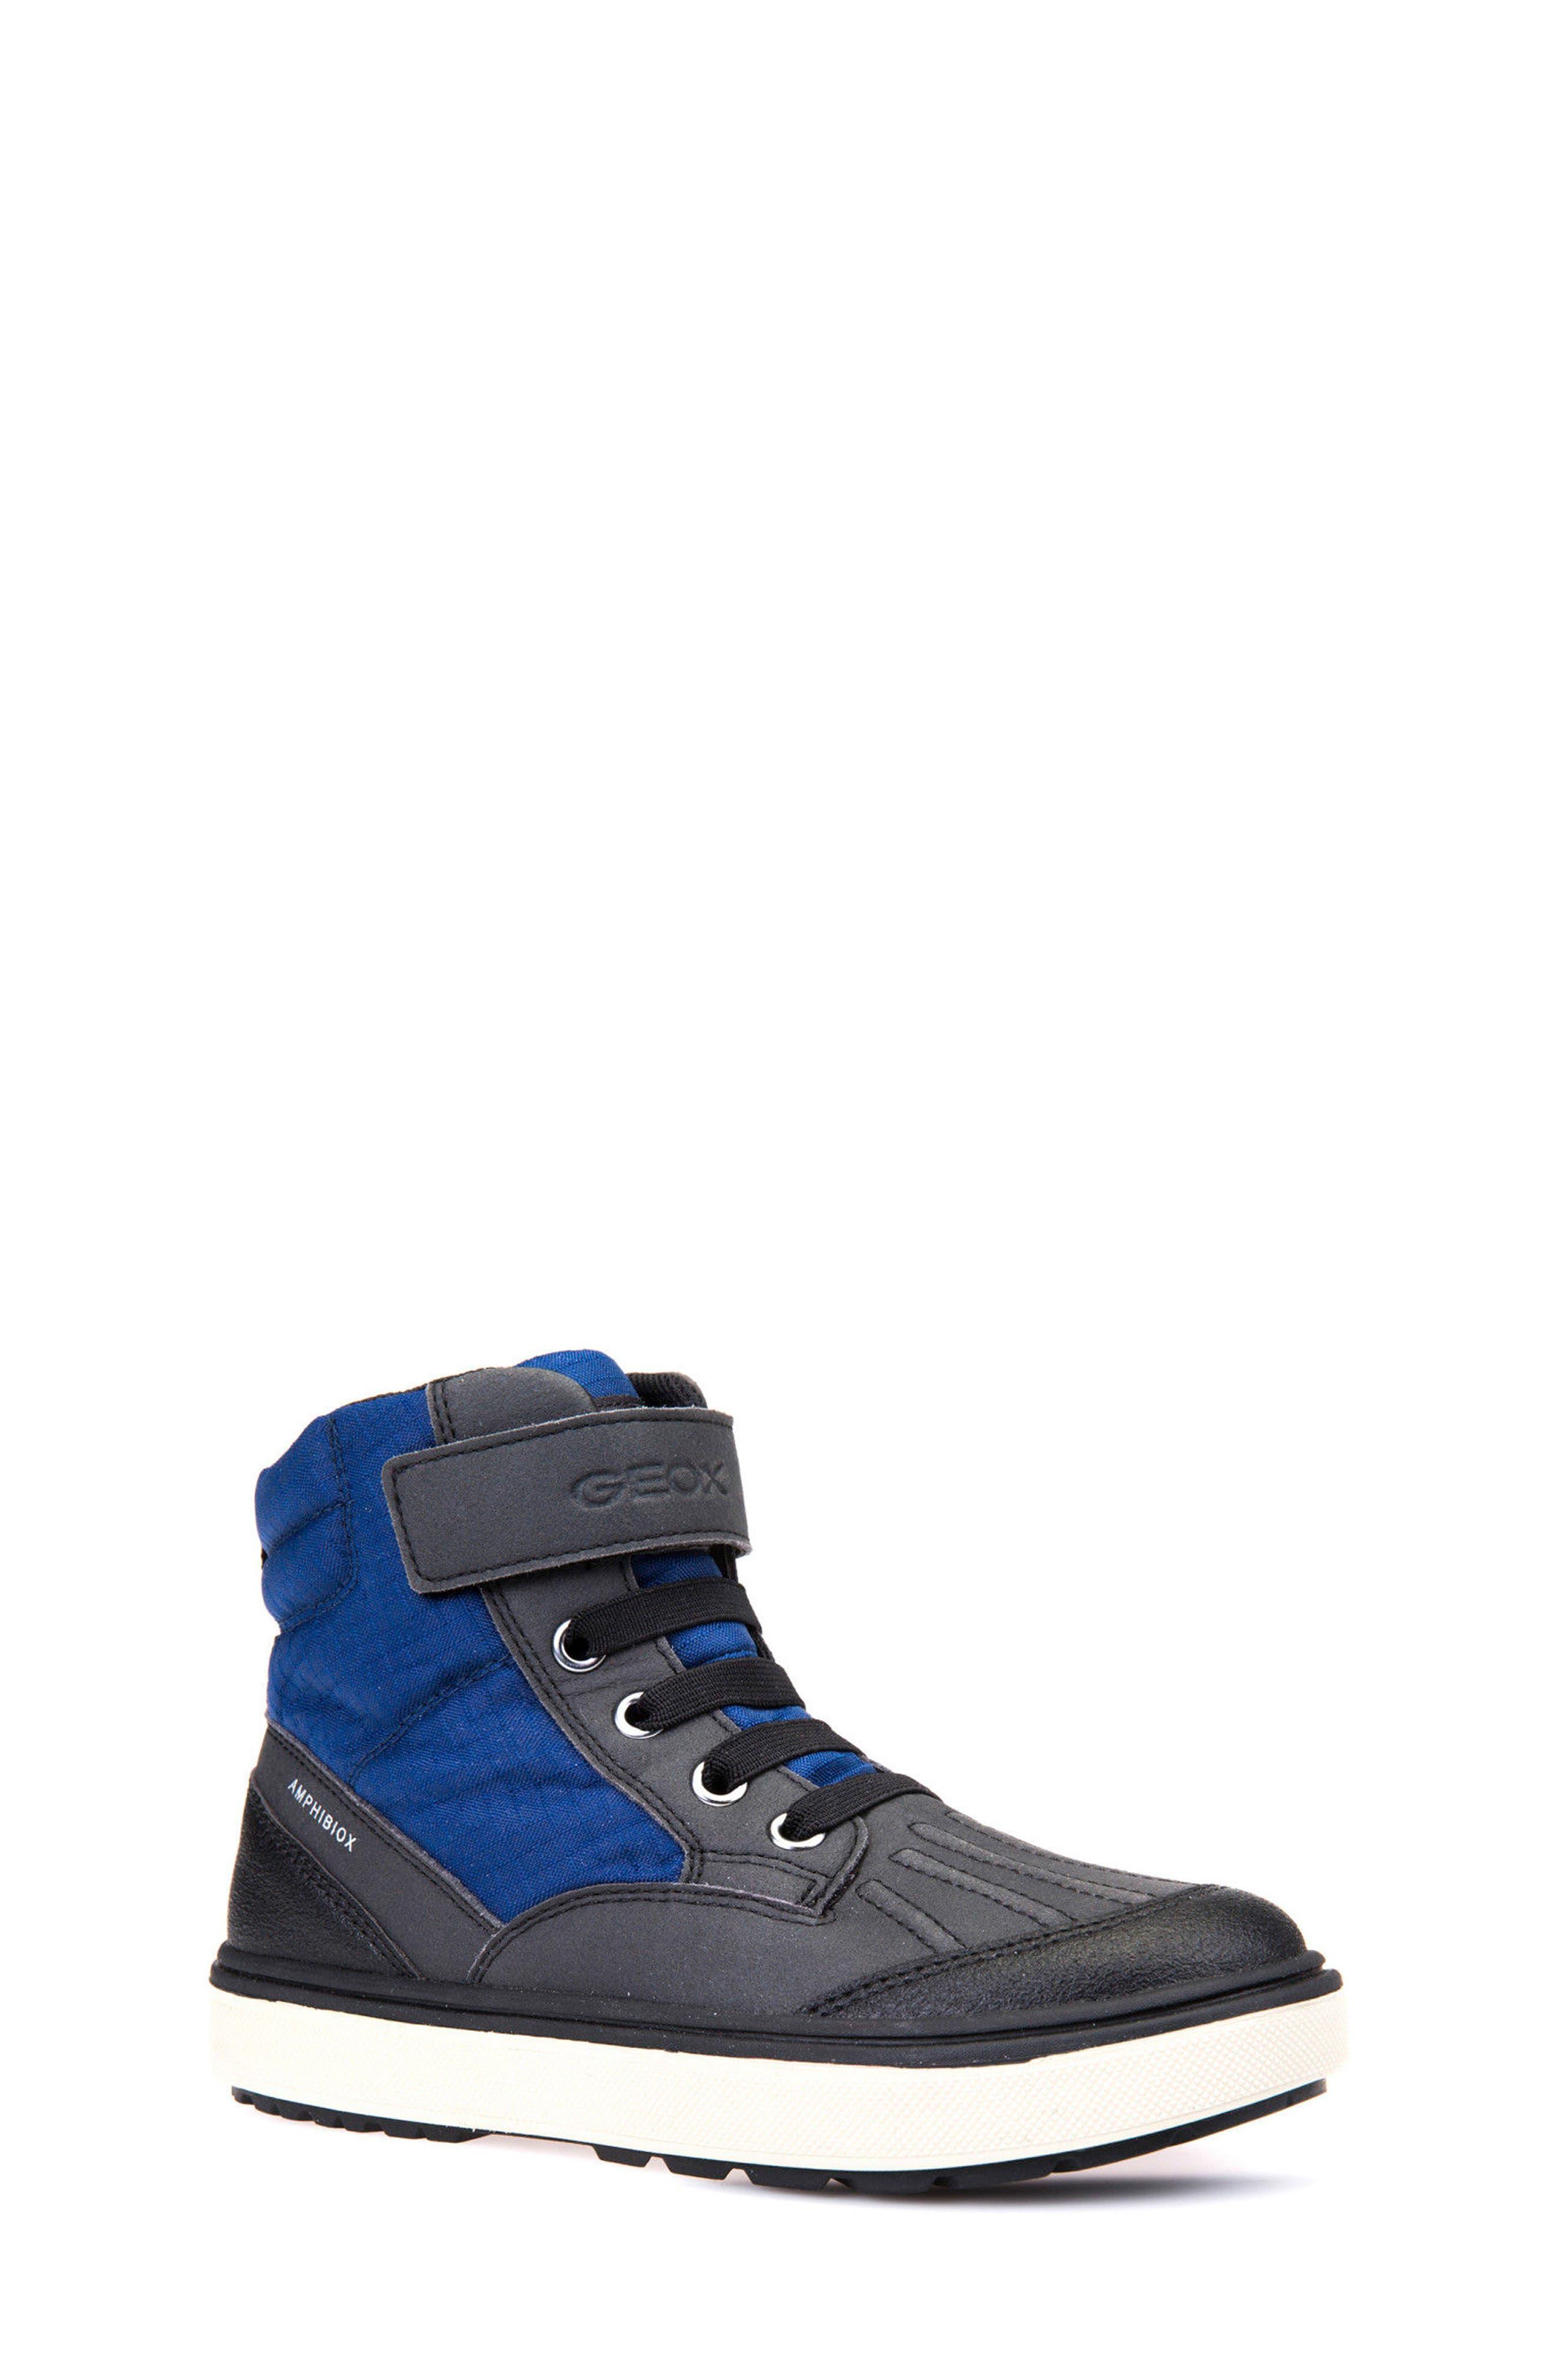 Alternate Image 1 Selected - Geox 'Mattias - ABX' Amphibiox® Waterproof Sneaker (Toddler, Little Kid & Big Kid)